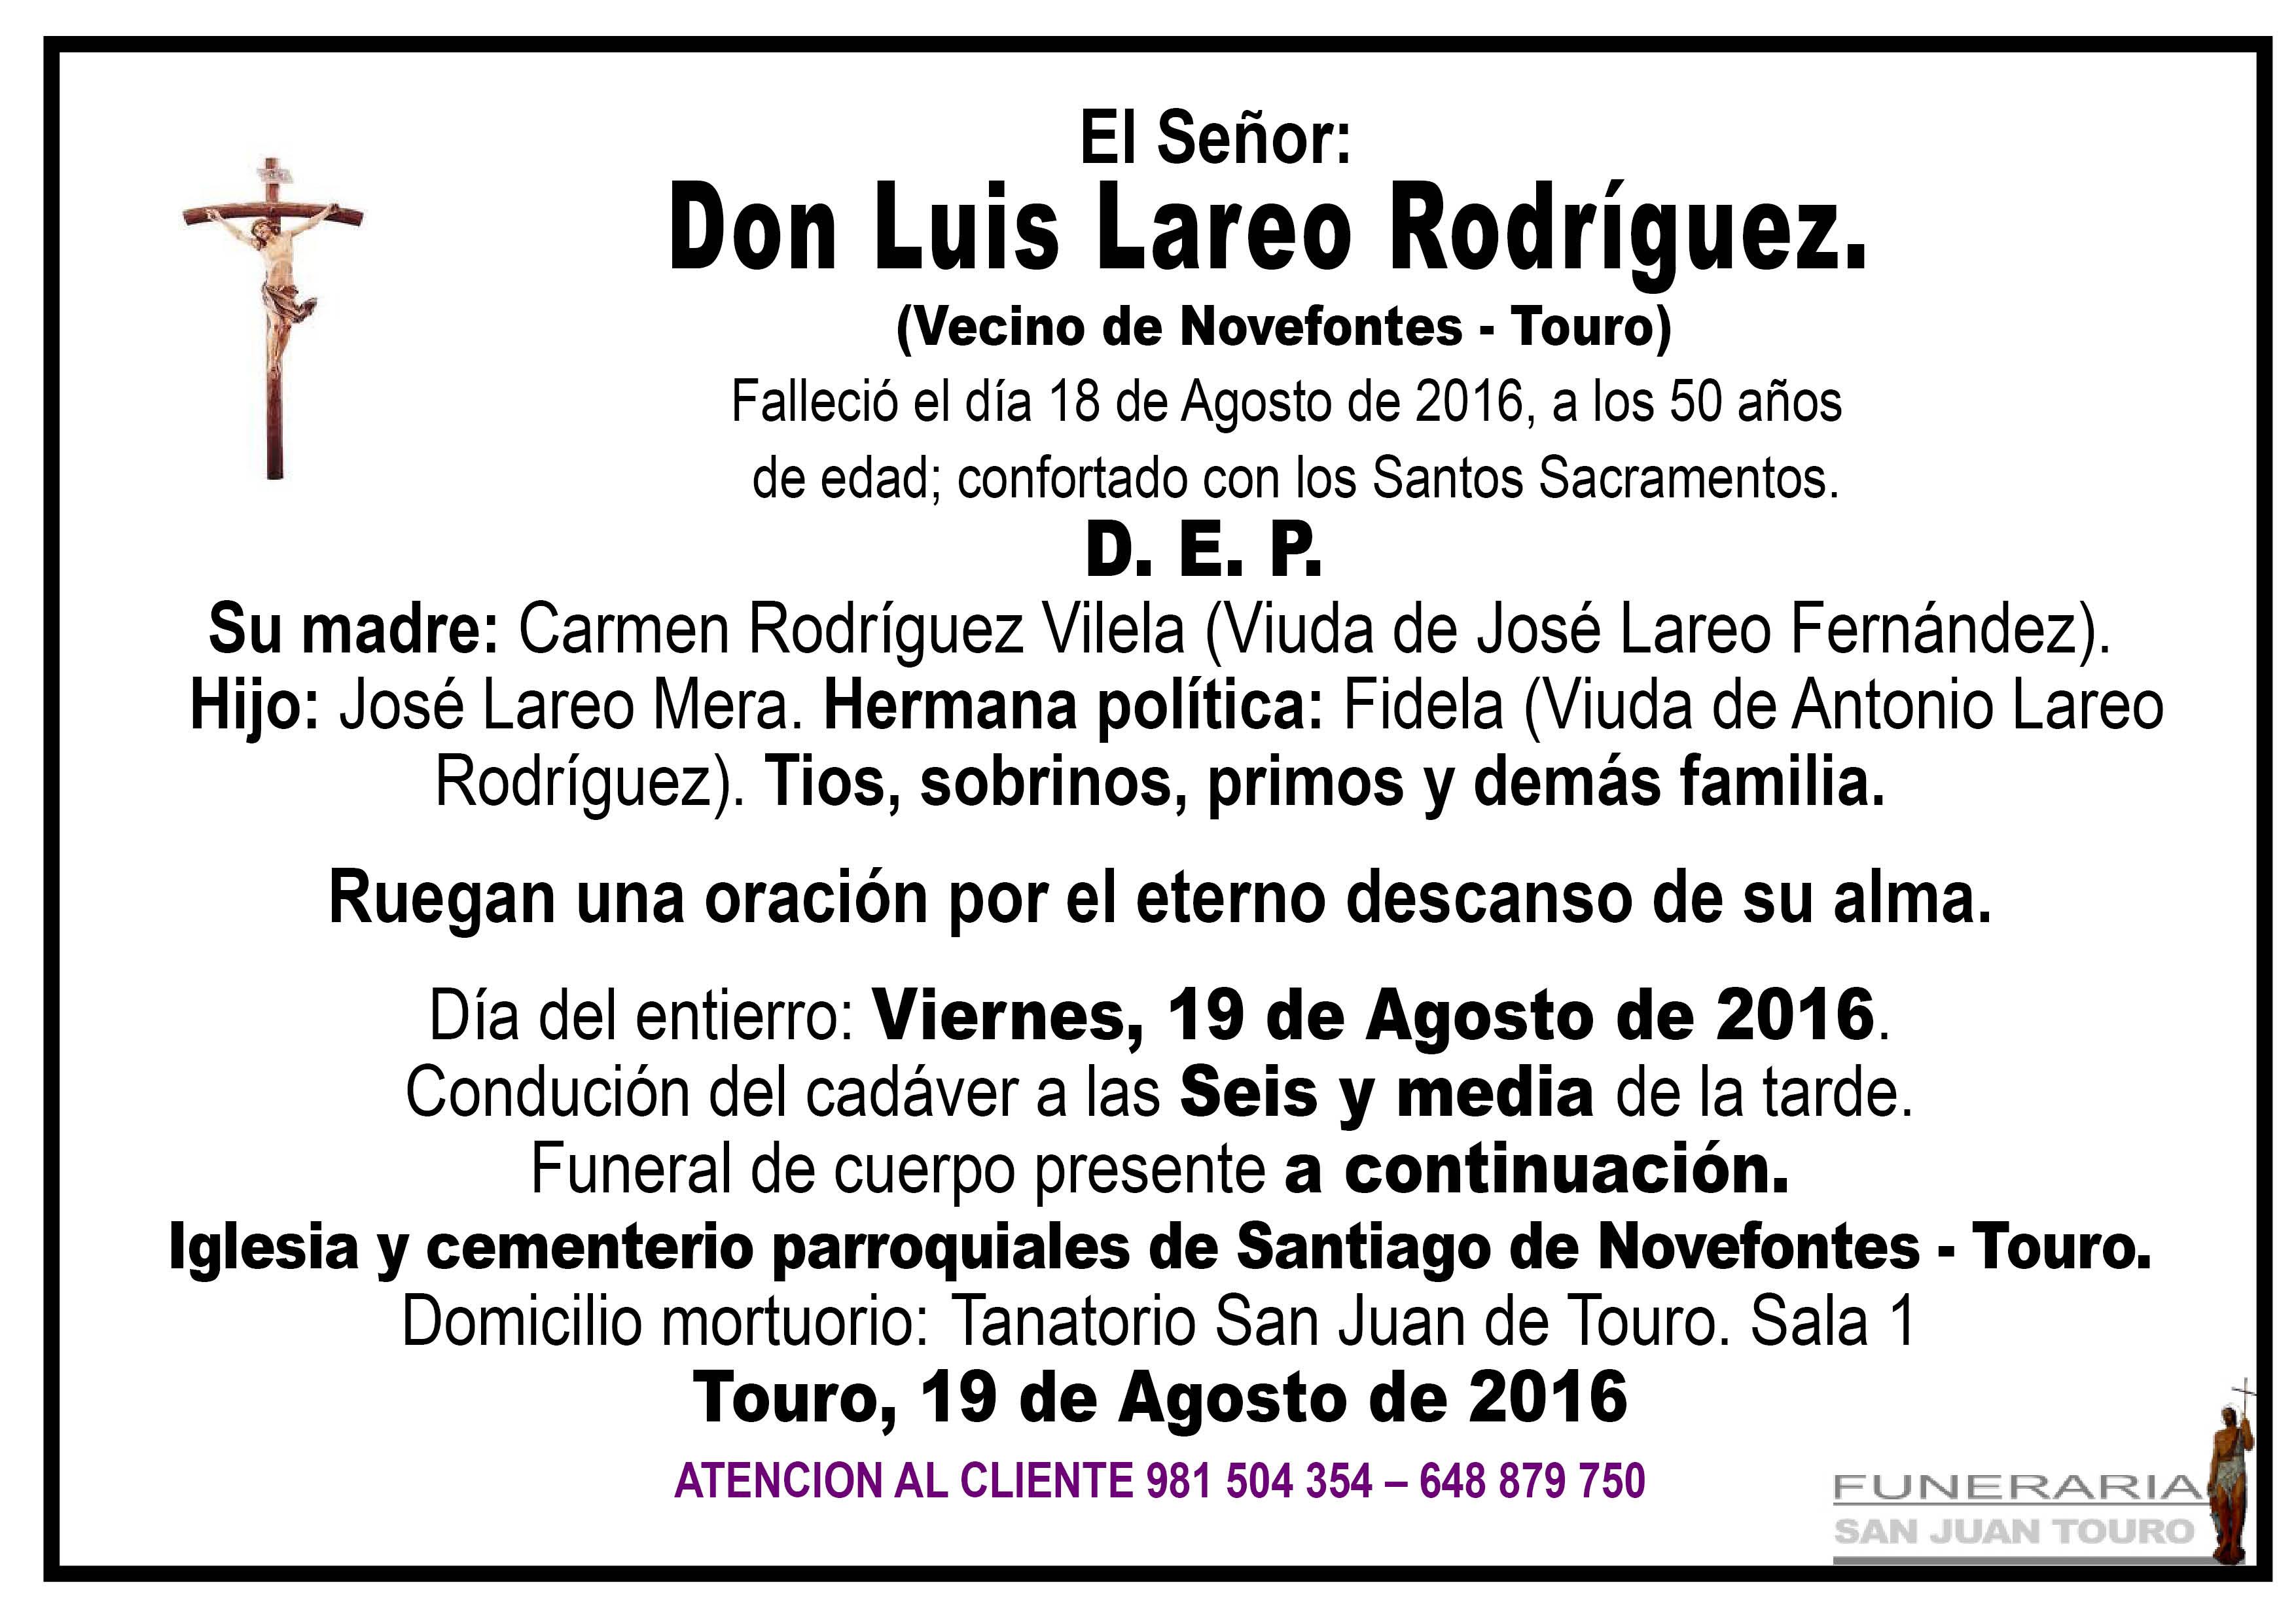 Esquela de SEPELIO D. LUIS LAREO RODRÍGUEZ